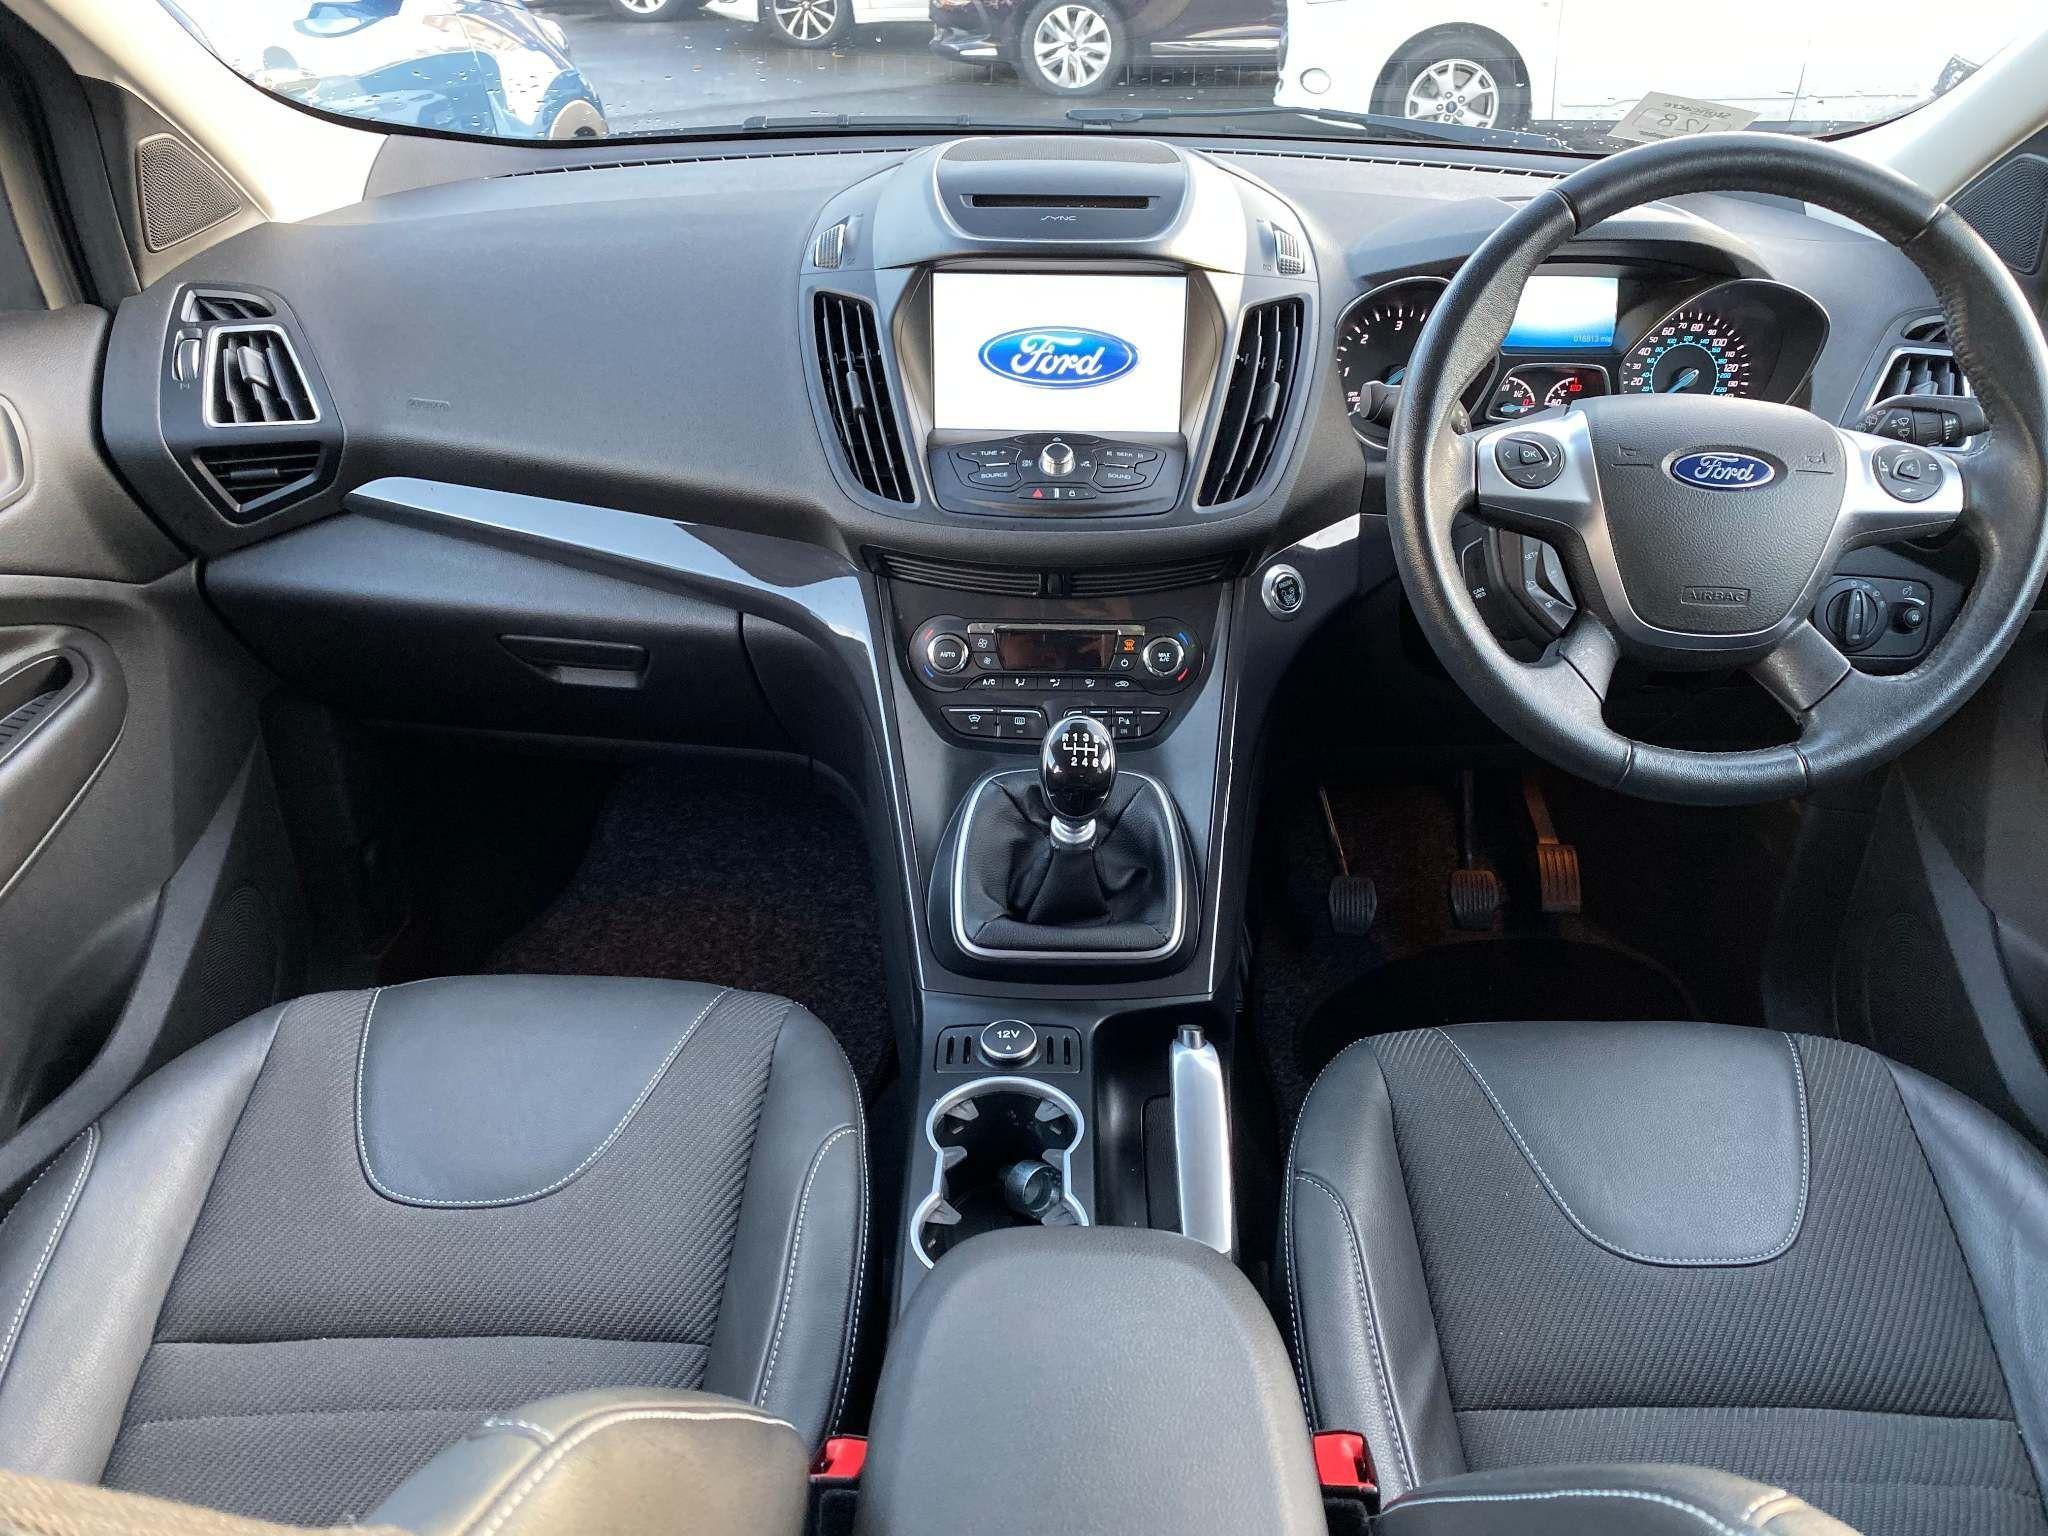 Ford Kuga 2.0 TDCi Titanium 5dr 2016 TRAX BLUE PANEL SEAT COVERS